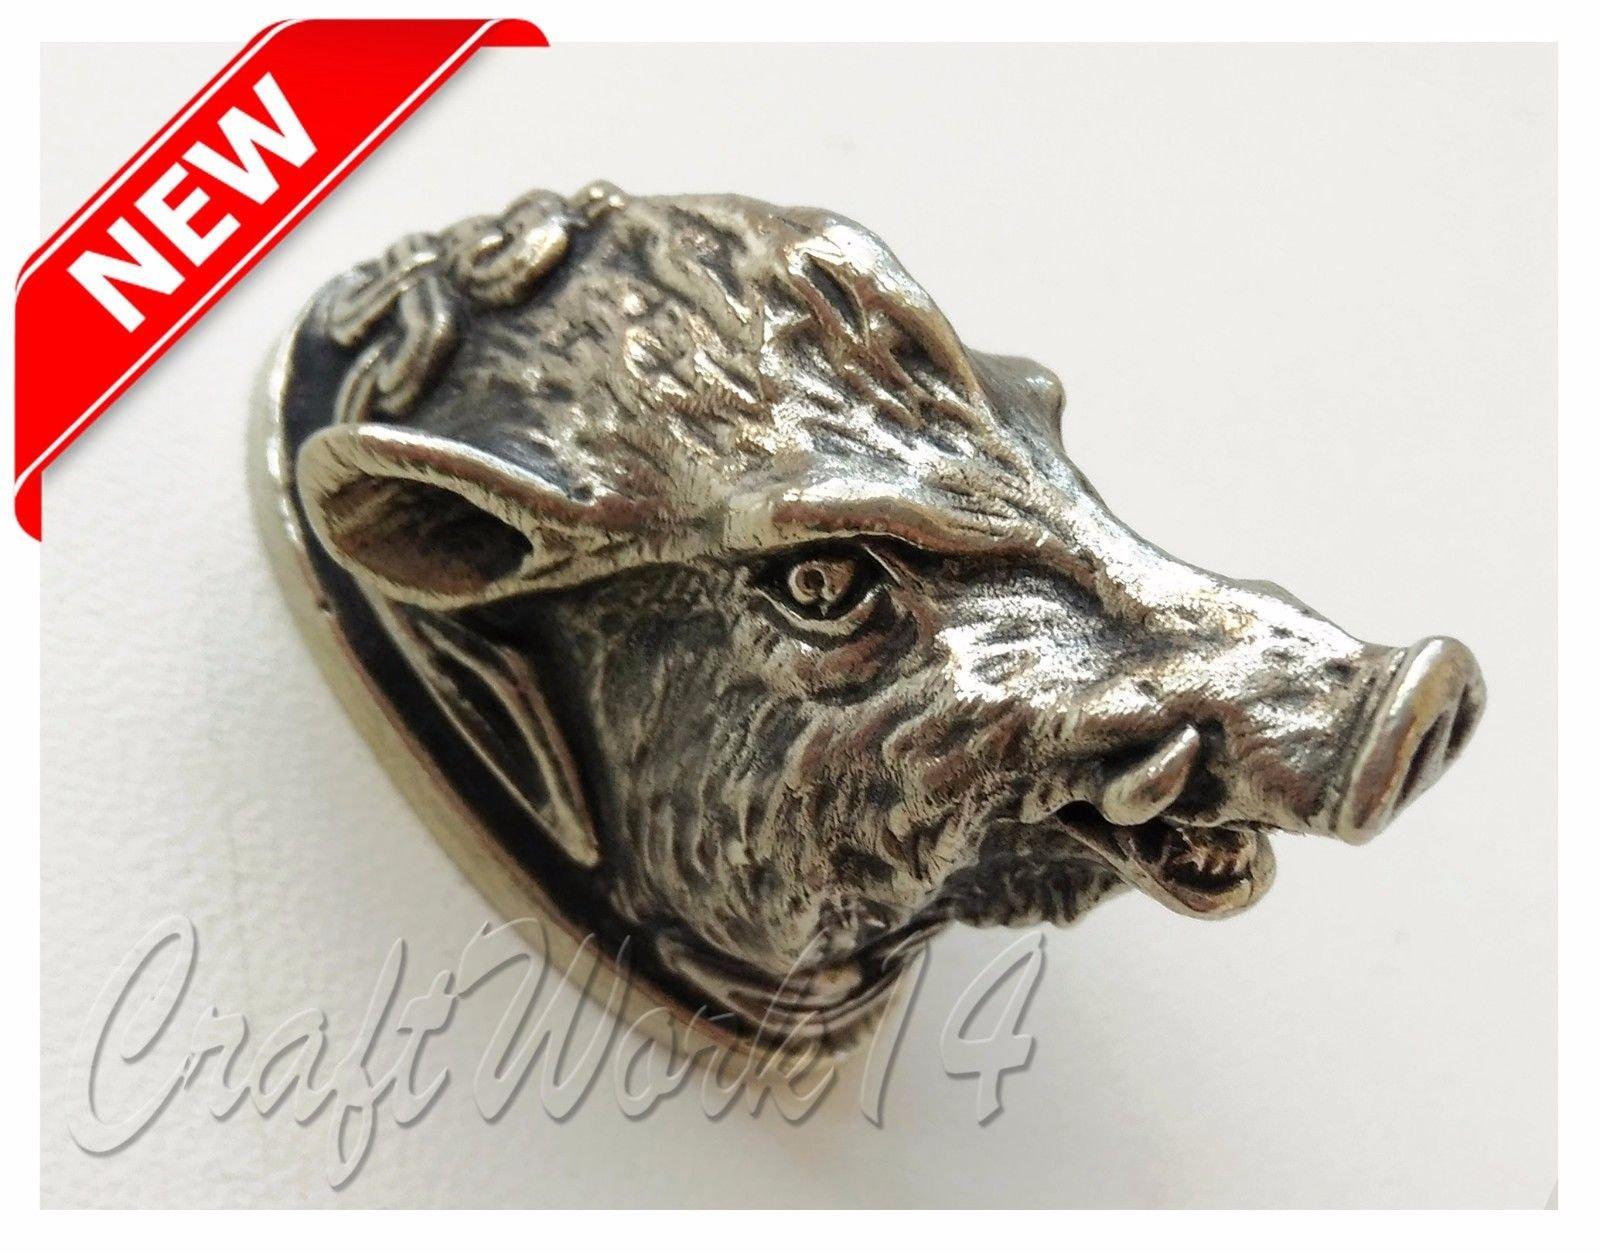 CooB - by Finger Guard & Knives Knife Pommel Bolster Silver/Bronze for Custom Handle Knife Making + Branded Lucky Dice Bead for KNIFE LANYARD, PARACORD BRACELETS in GIFT! (CELTIC WILD BOAR)